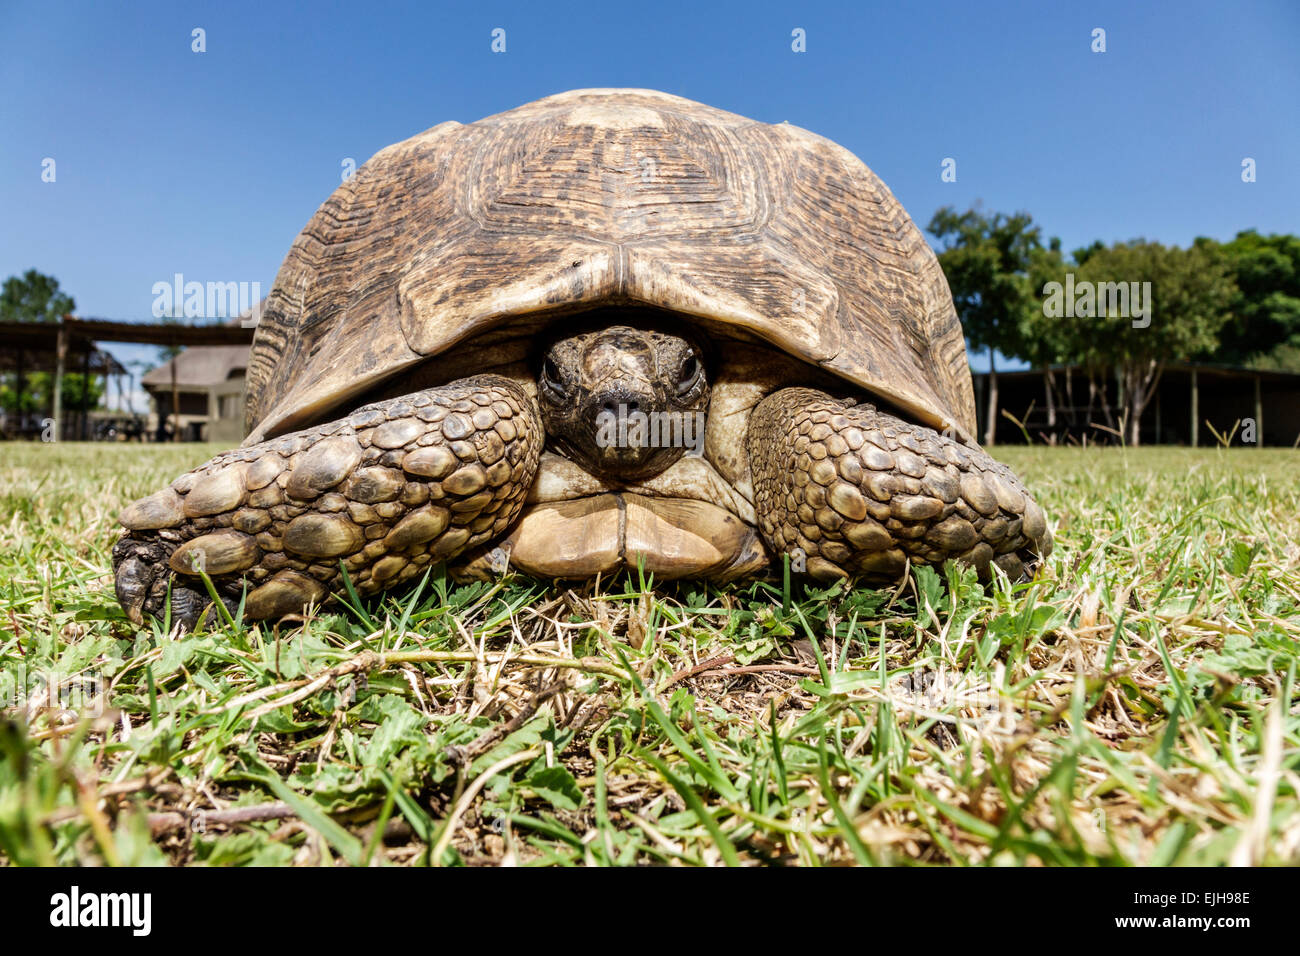 Johannesburg South Africa African Croc City Crocodile & and Reptile Park farm spurred tortoise Centrochelys - Stock Image